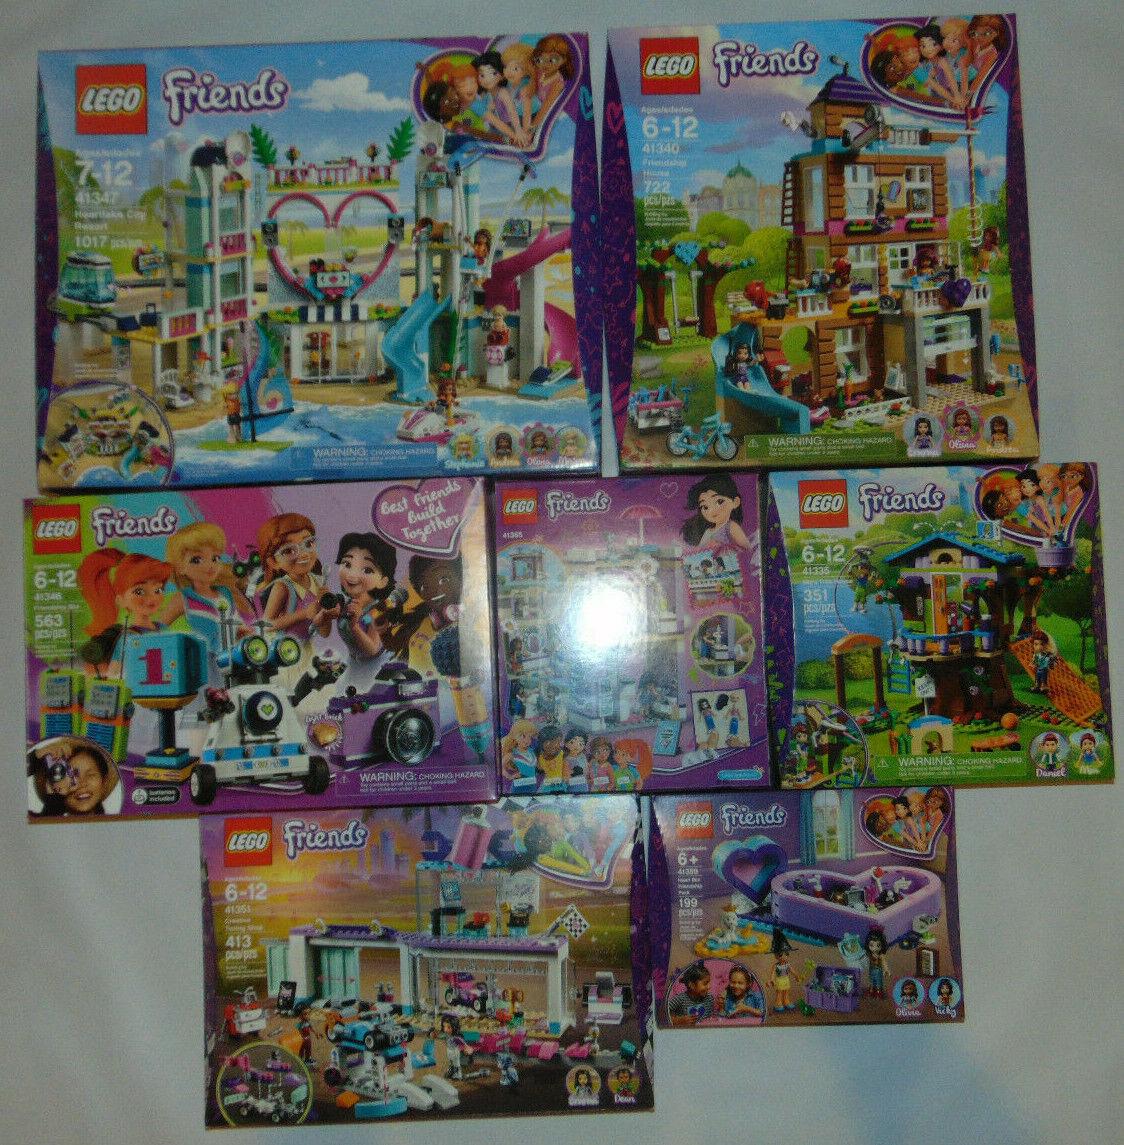 7) Lego Friends lot 41365 41359 41335 41346 41347 41340 41351 NEUF  USA Vendeur